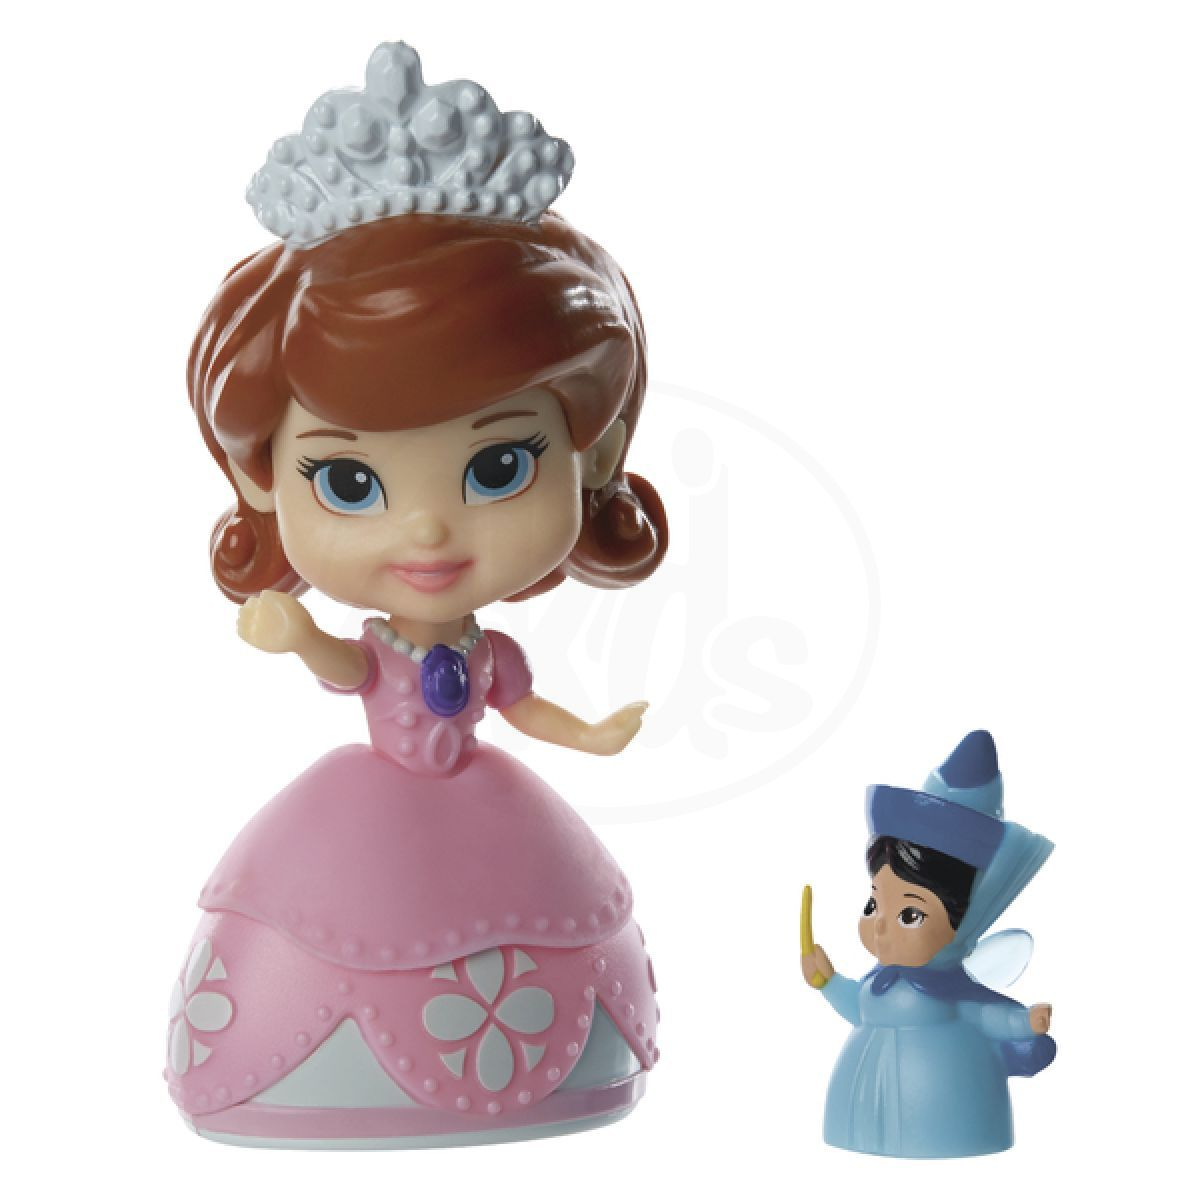 Jakks Pacific Disney Mini princezna a kamarád - Sofia and Merryweather